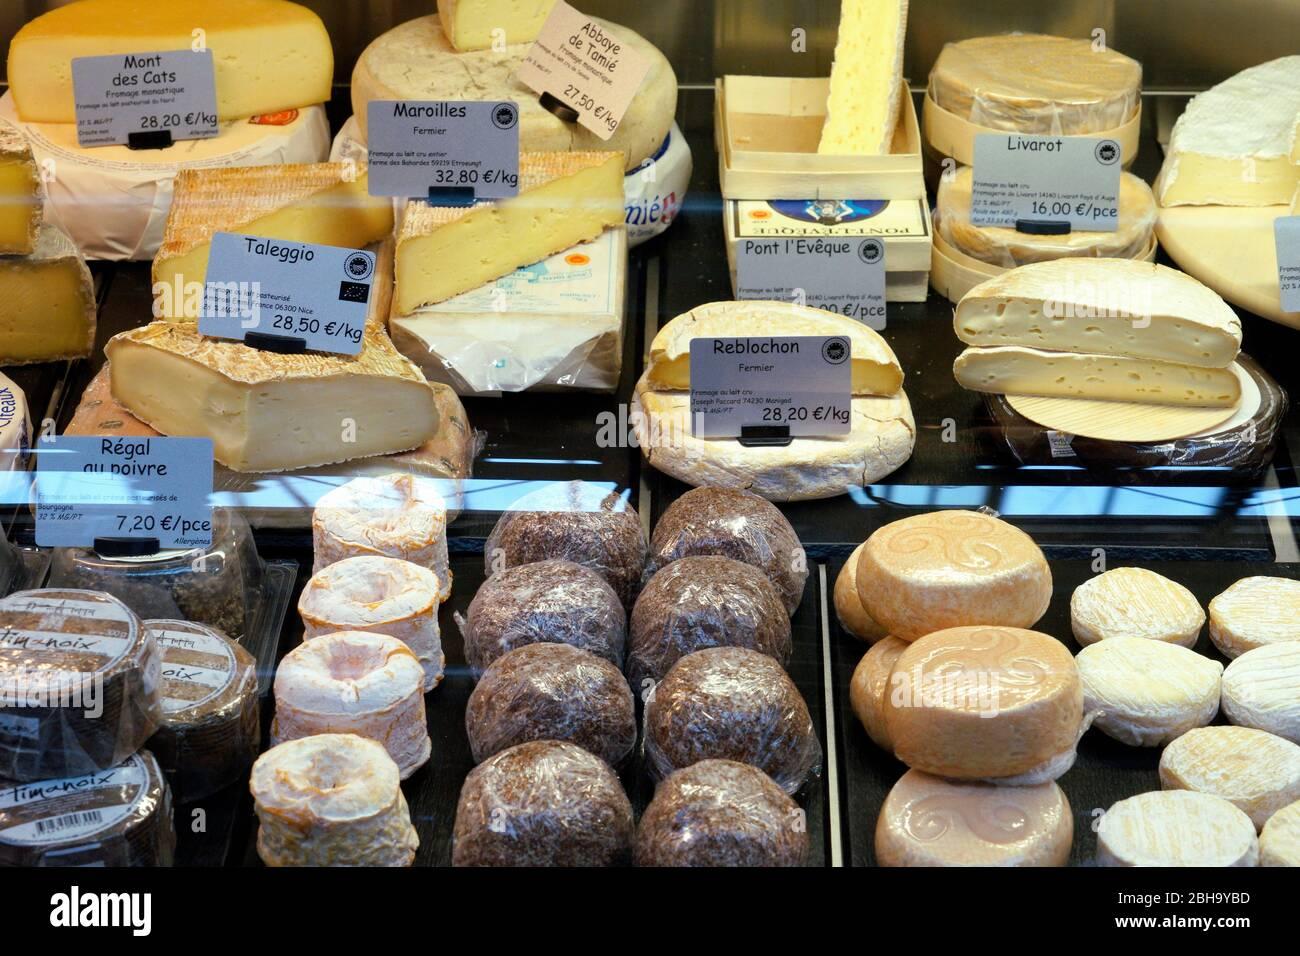 France, Alsace, Alsace Wine Route, Colmar, Market, Market Hall, Marche couvert de Colmar, Permanent Regional Market, Cheese Stand, Cheeses, Detail Stock Photo